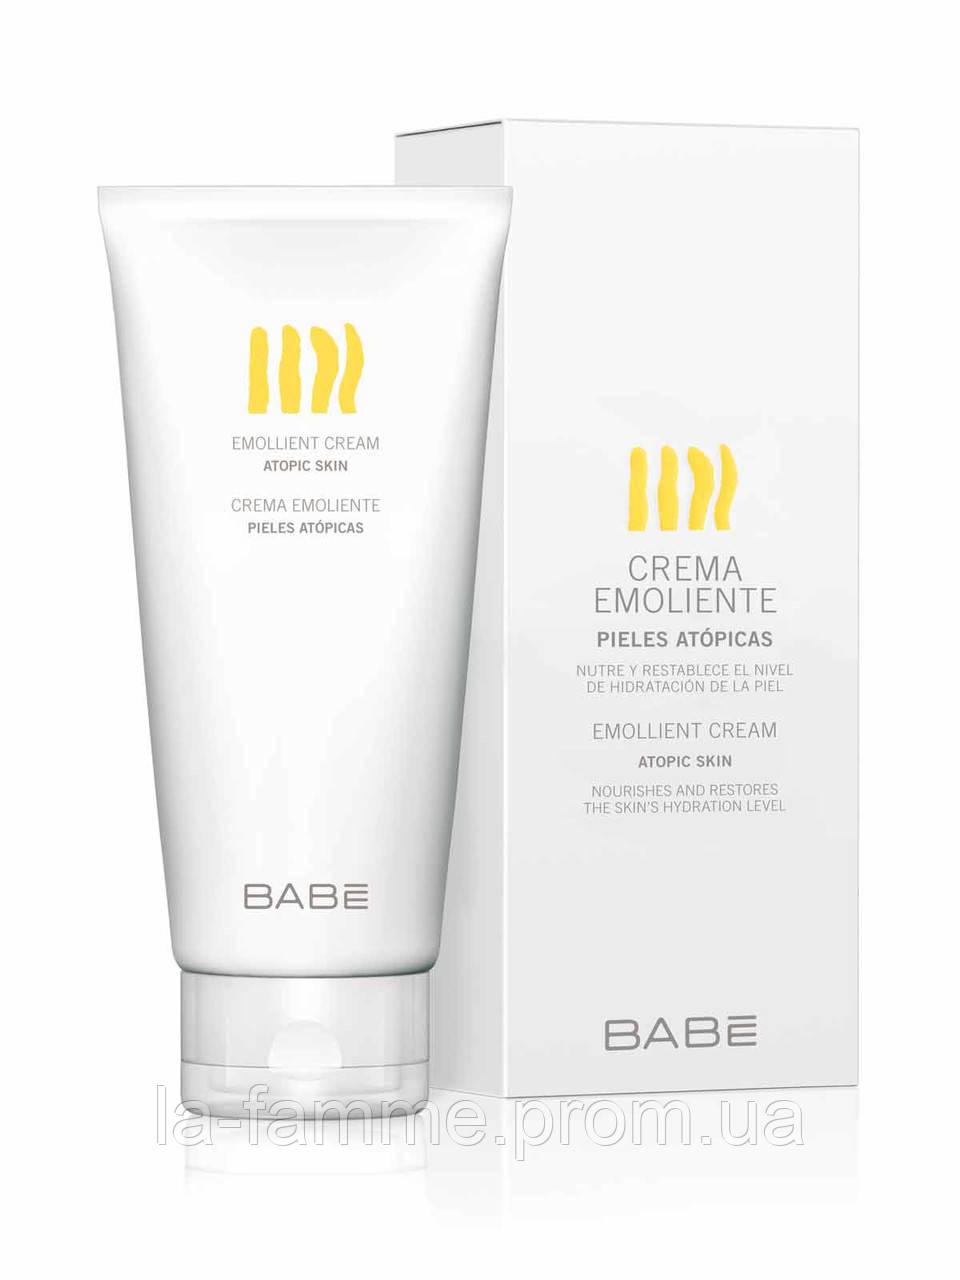 Увлажняющий крем для проблемной сухой кожи,BABE, 200 мл